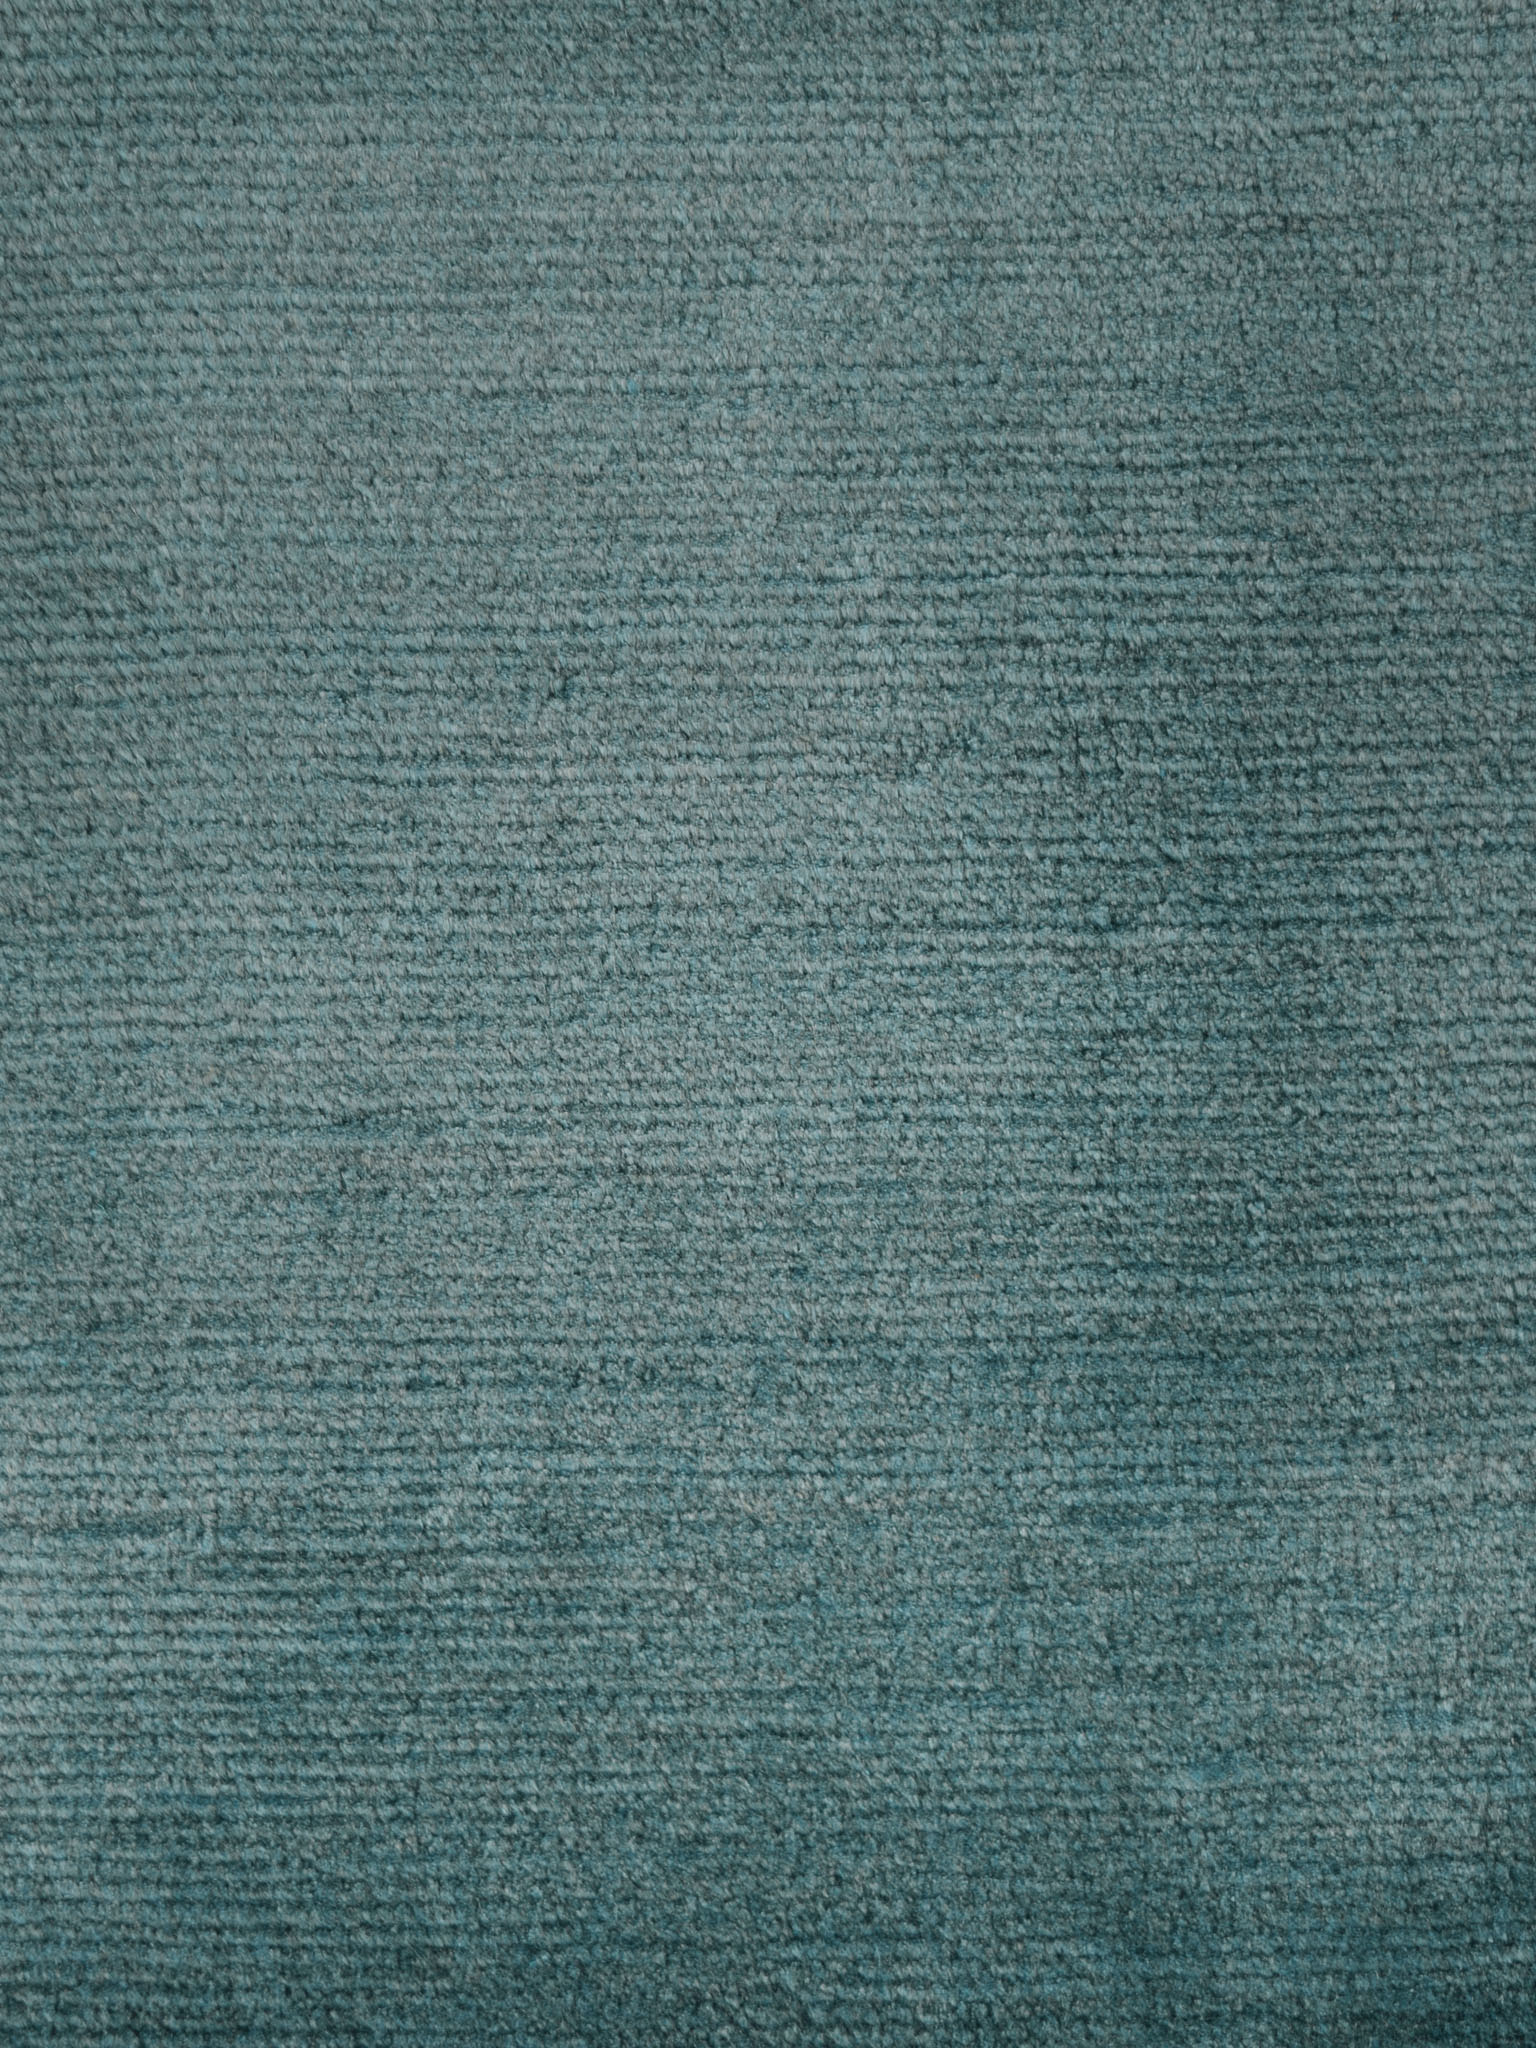 Muga Silk Solid HSPSA16113/312